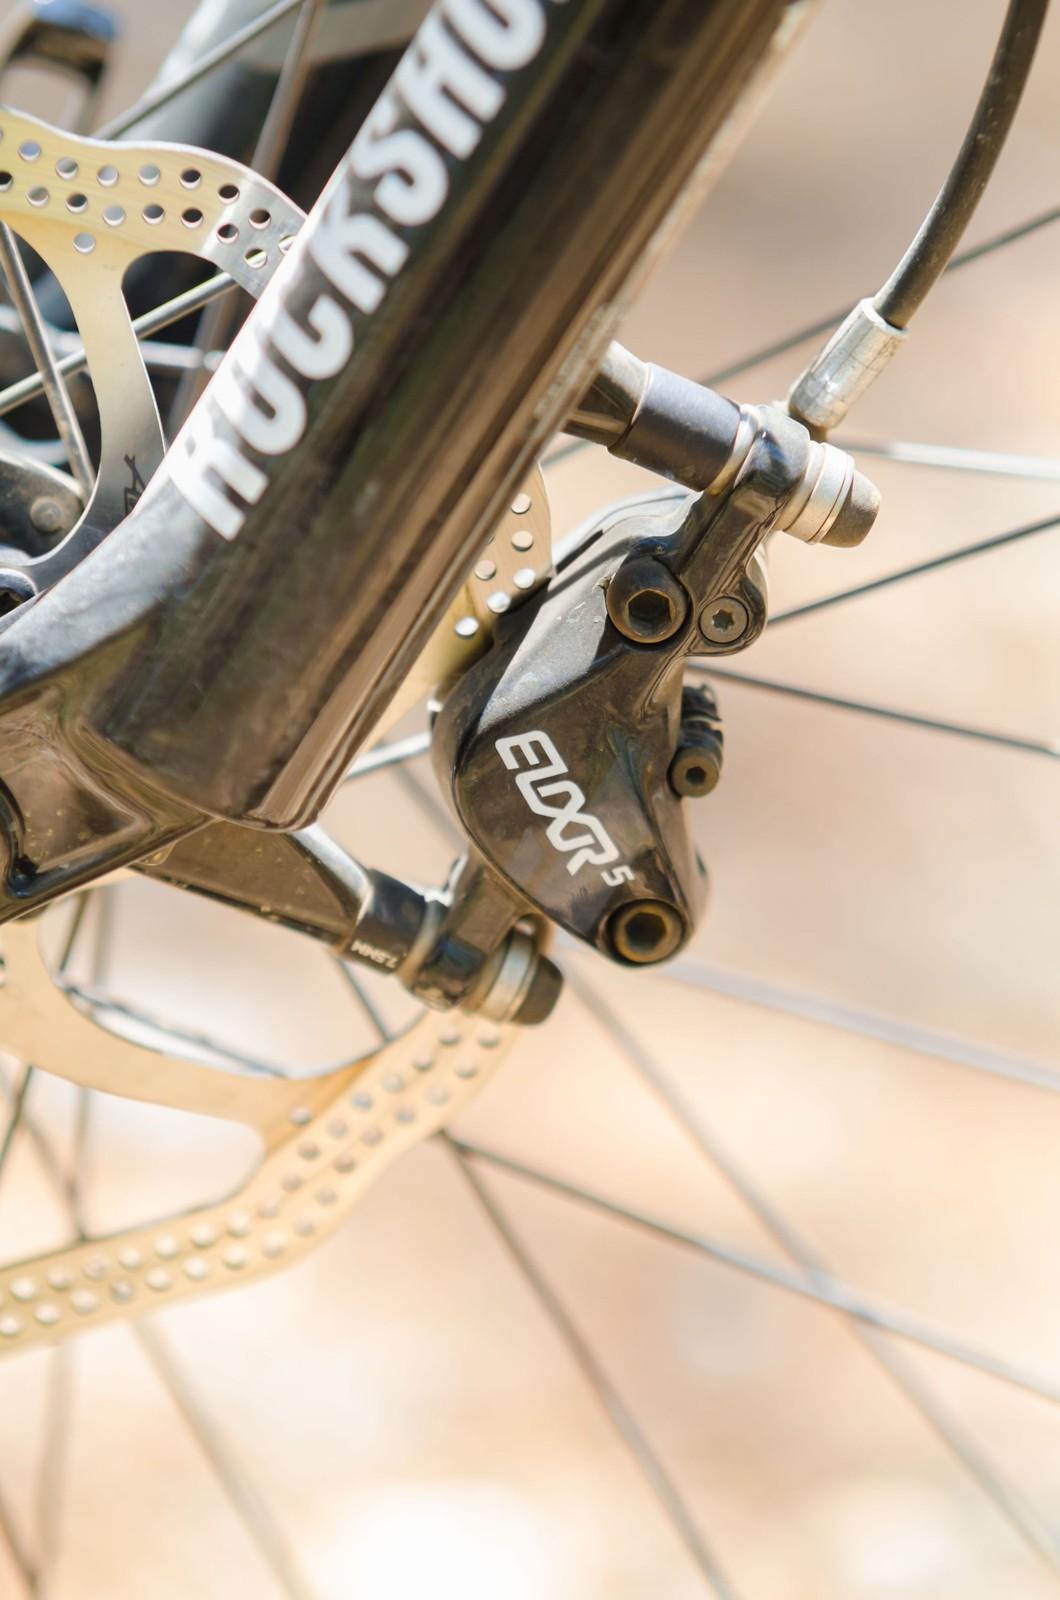 2013 Nukeproof Mega TR - Front brake - iceman2058 - Mountain Biking Pictures - Vital MTB